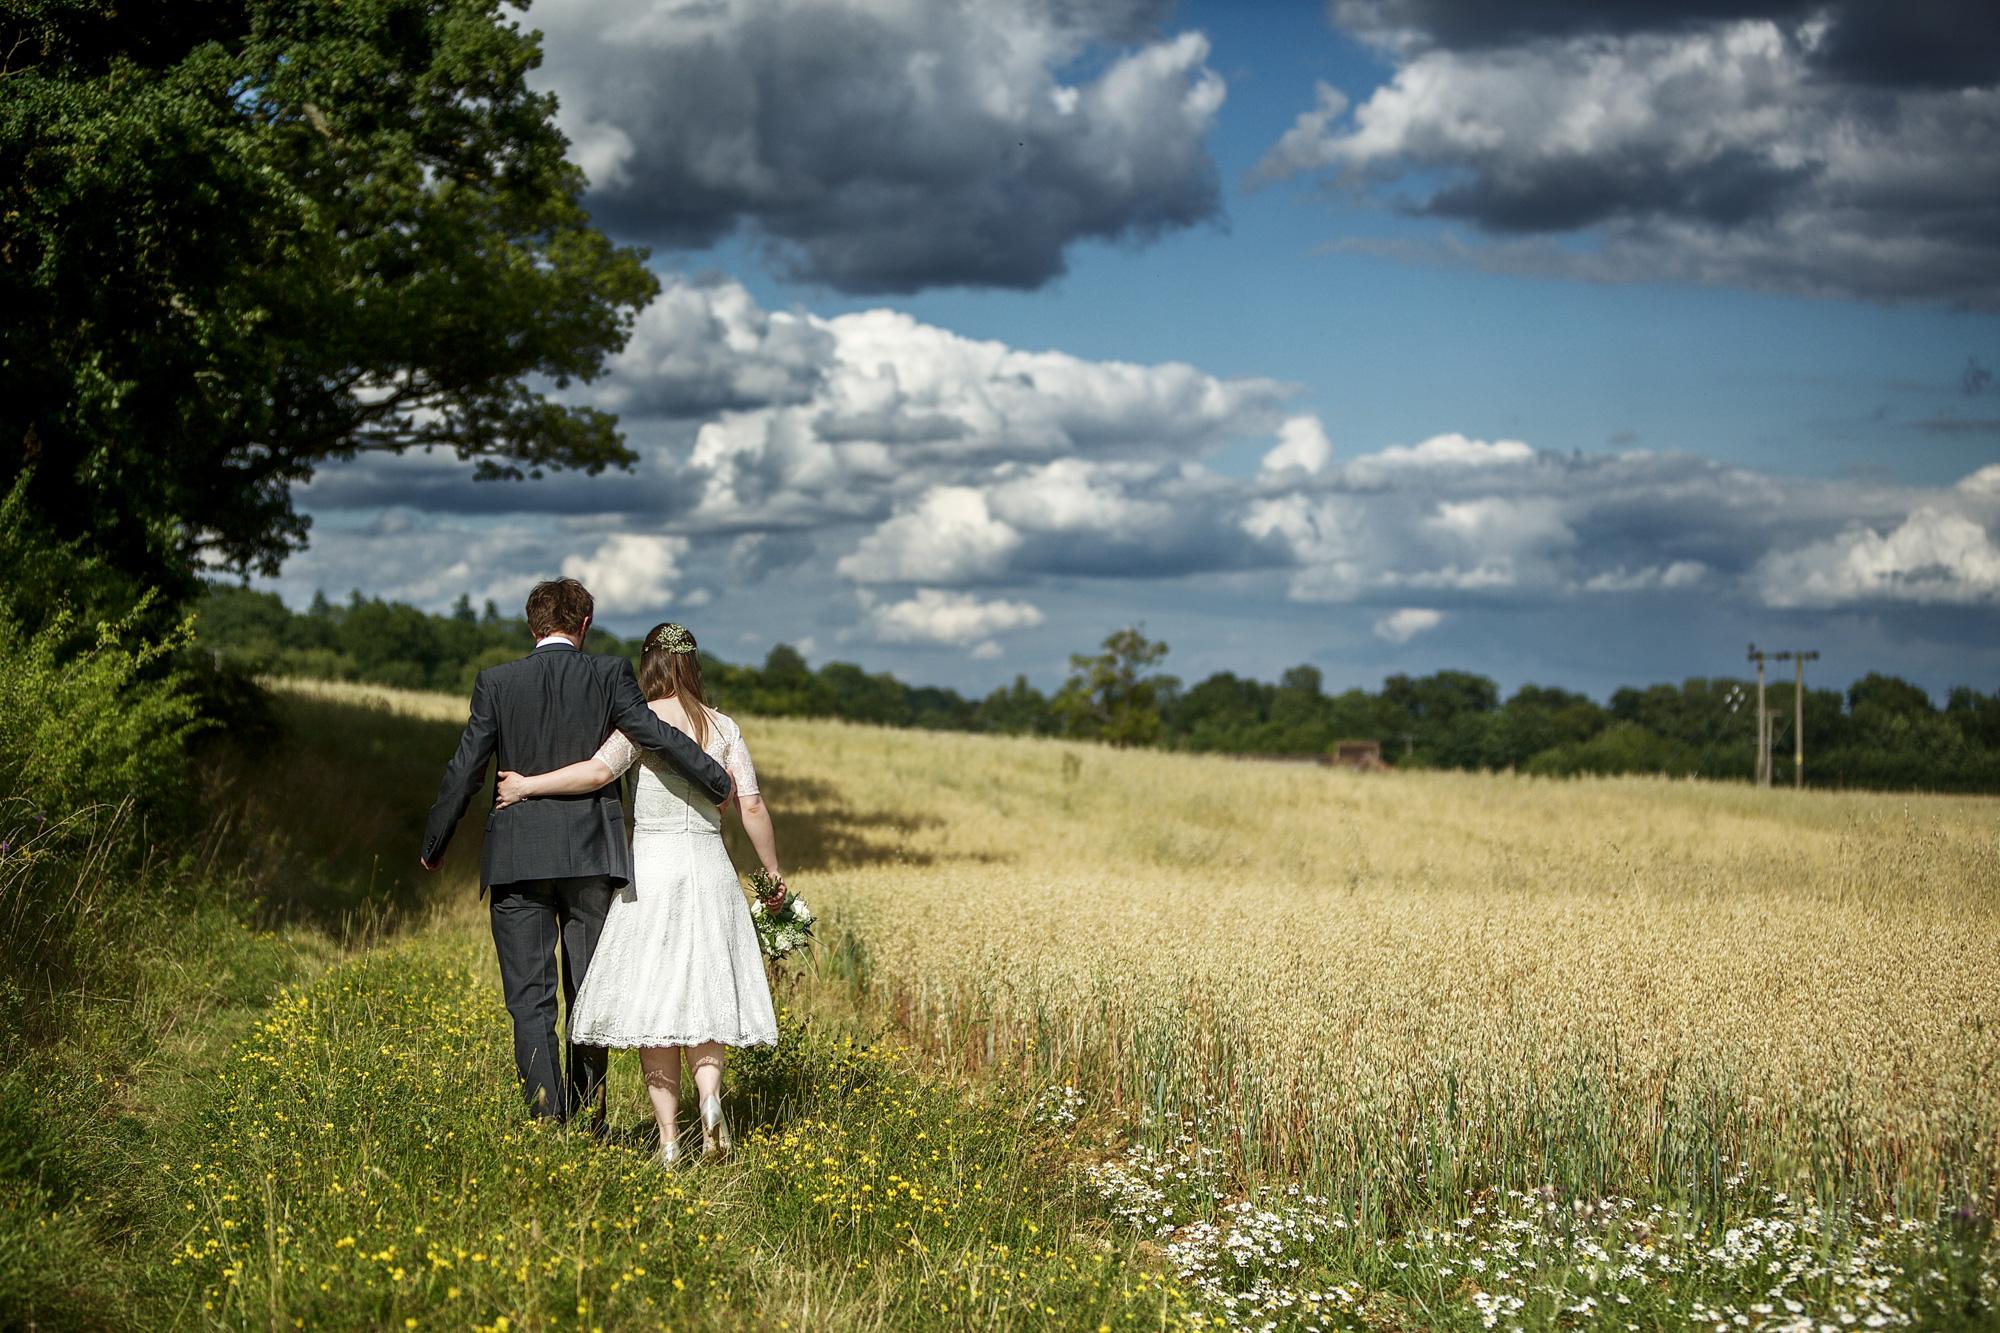 Adam_Hillier_Wedding_Photographer_Newbury_Berkshire_7 (8).jpg